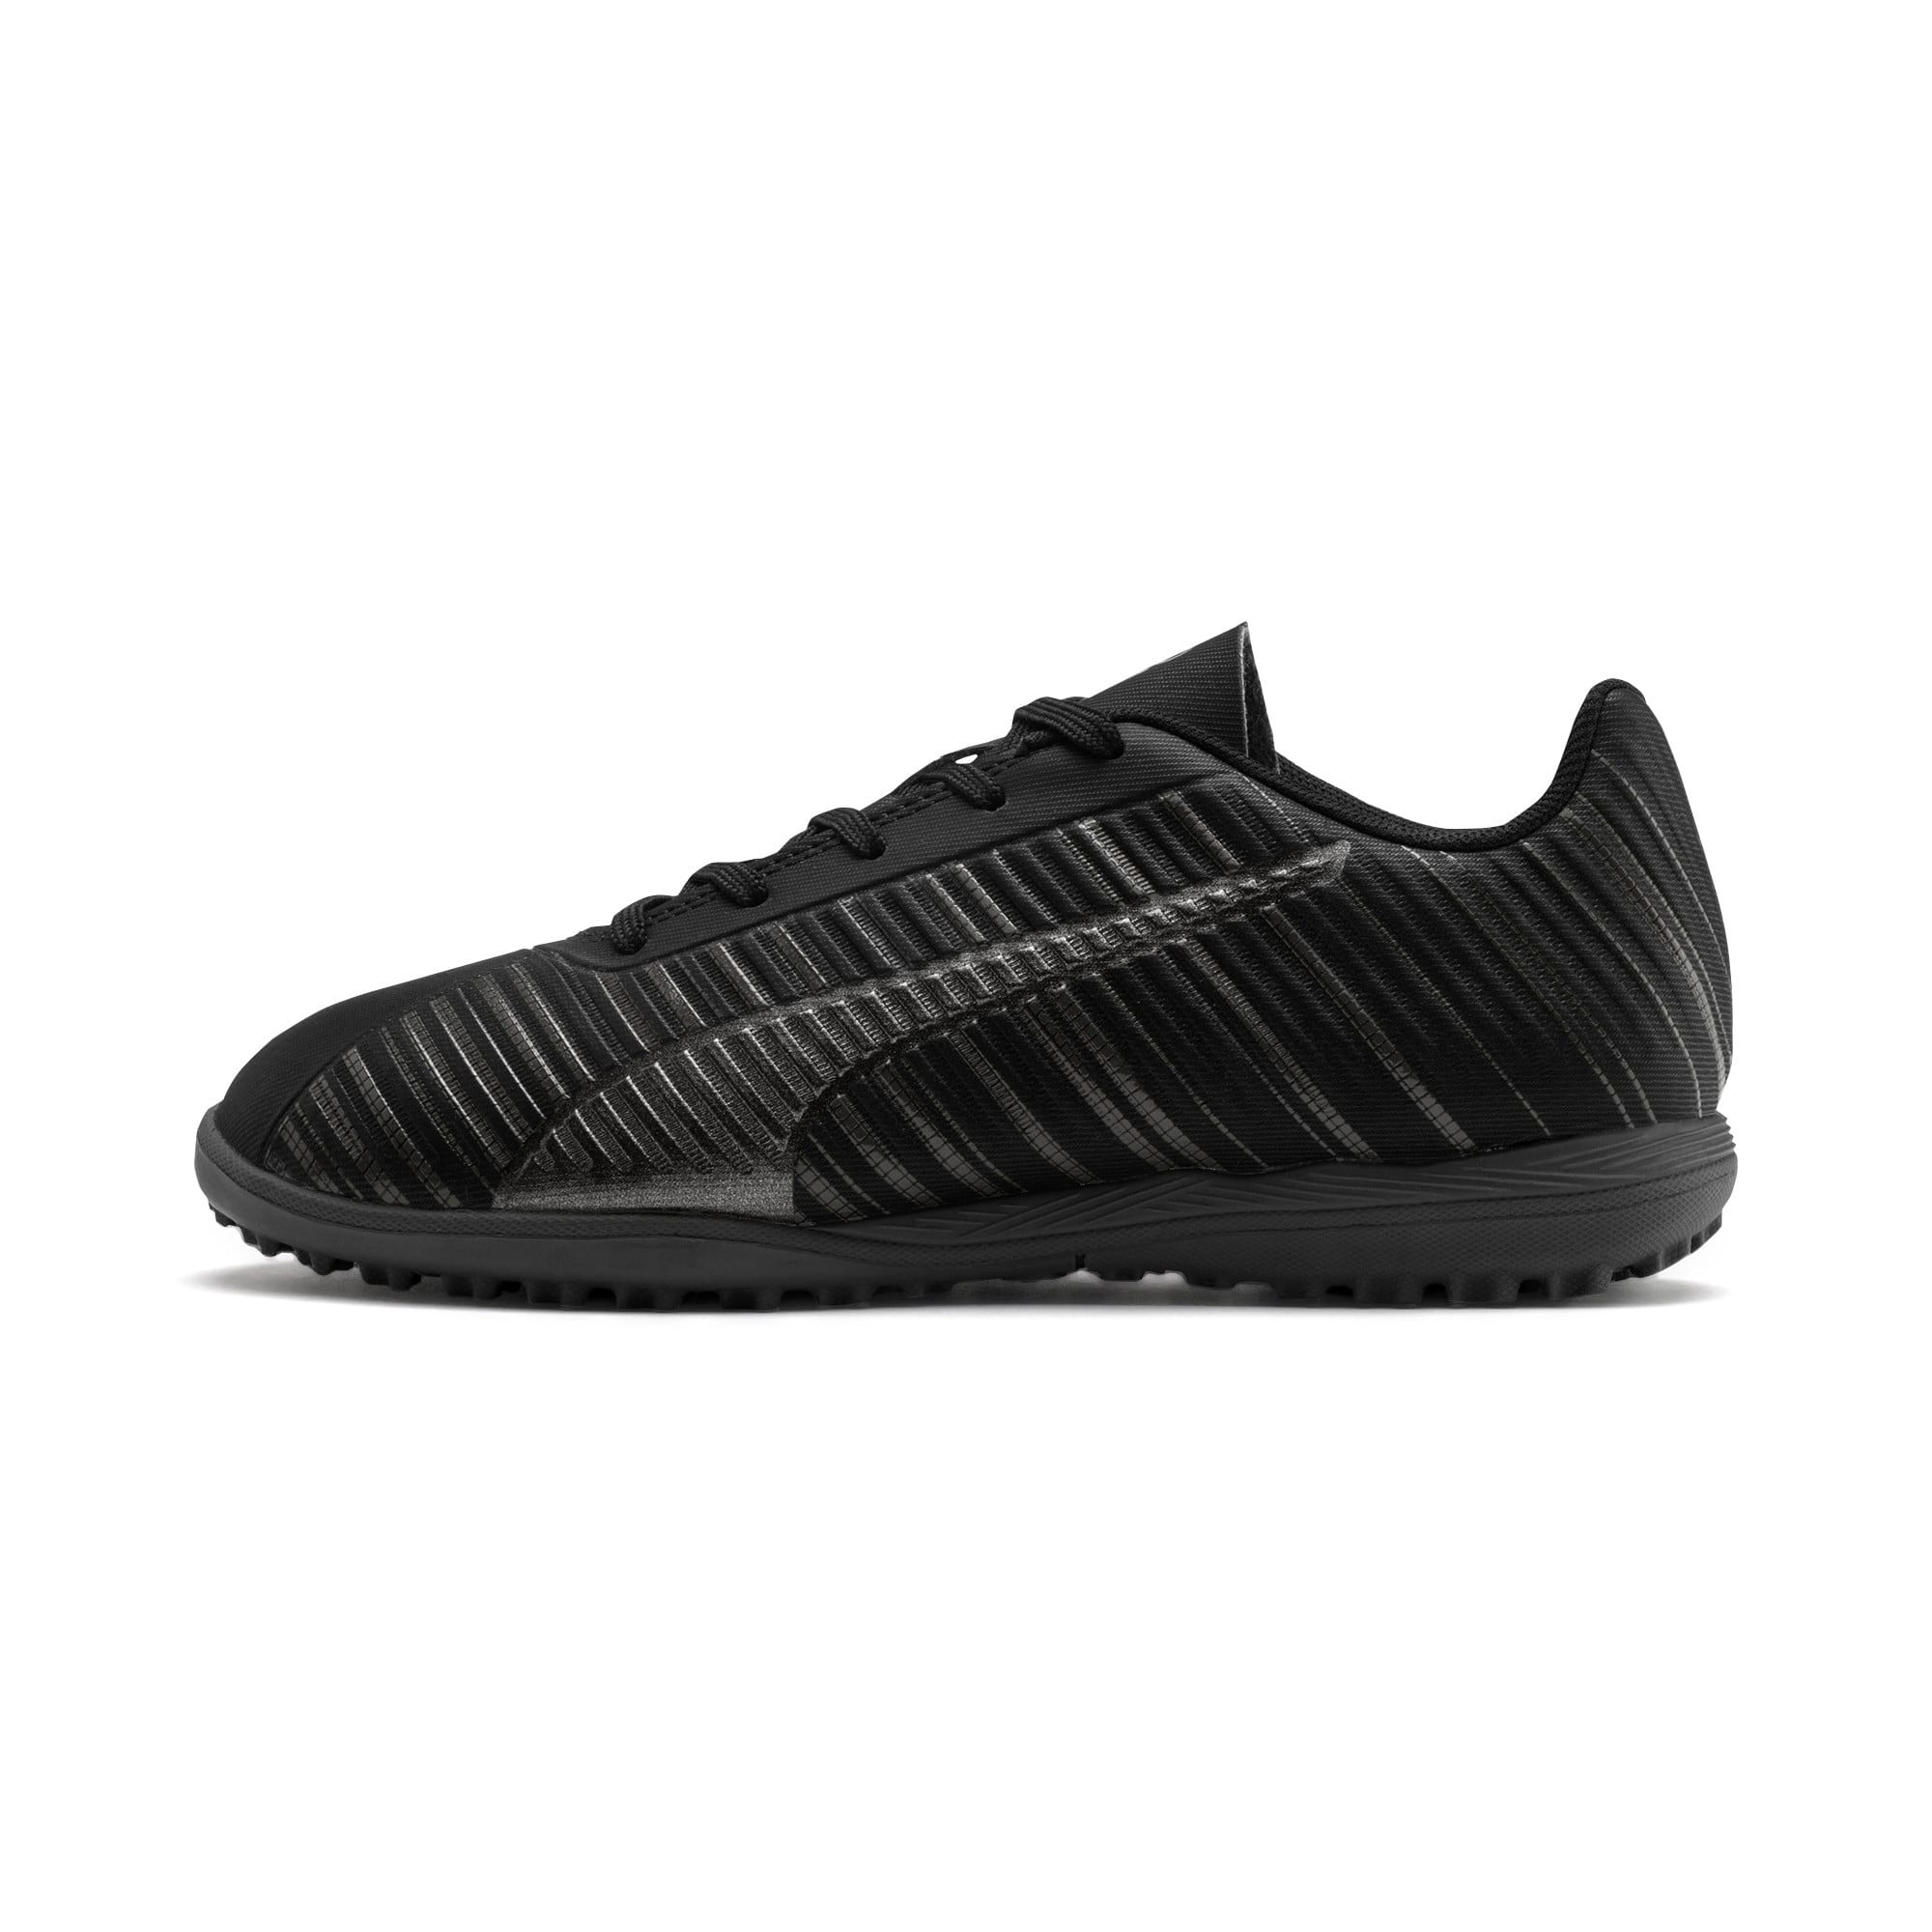 Thumbnail 1 of PUMA ONE 5.4 TT Soccer Shoes JR, Black-Black-Puma Aged Silver, medium